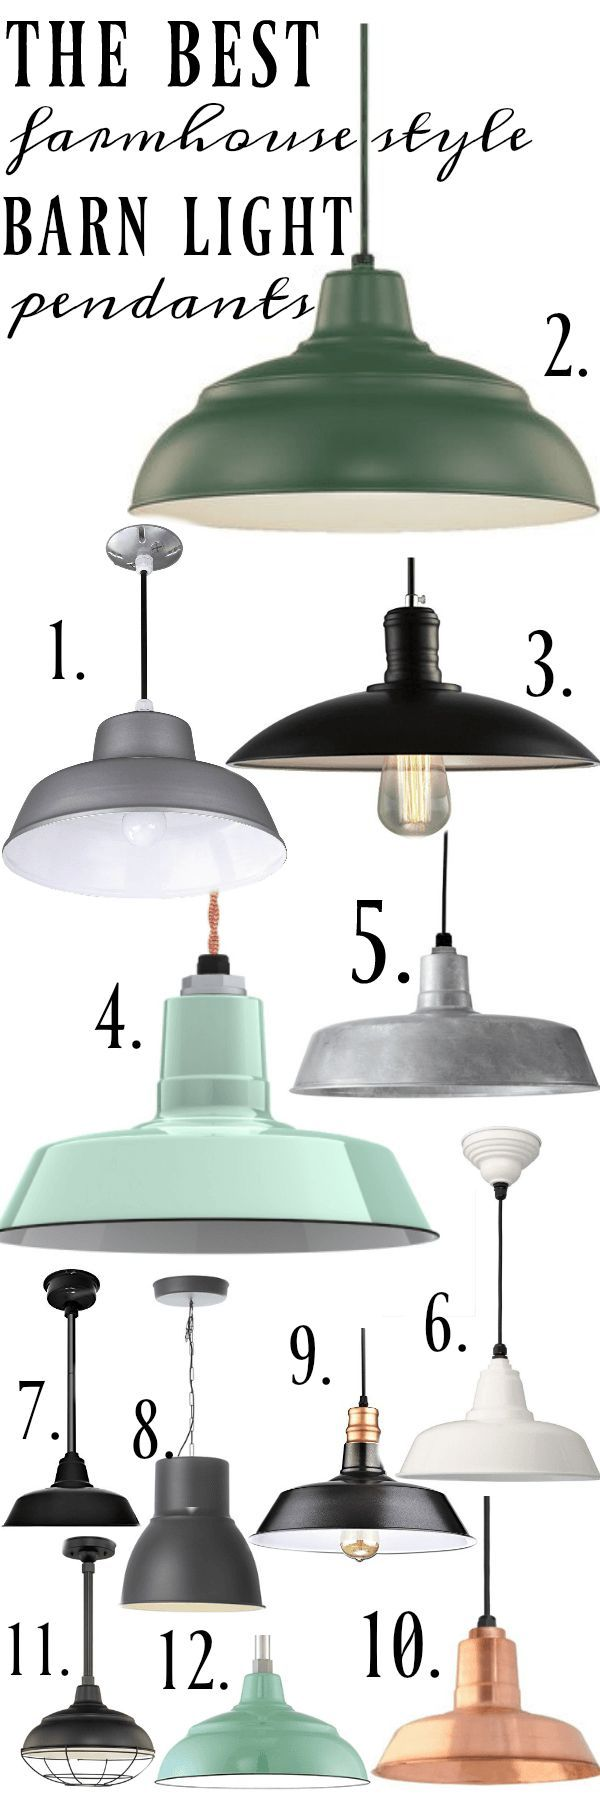 """The best farmhouse style barn light pendants - The best barn light pendants a must pin for indoor/outdoor farmhouse style/cottage style lights."""